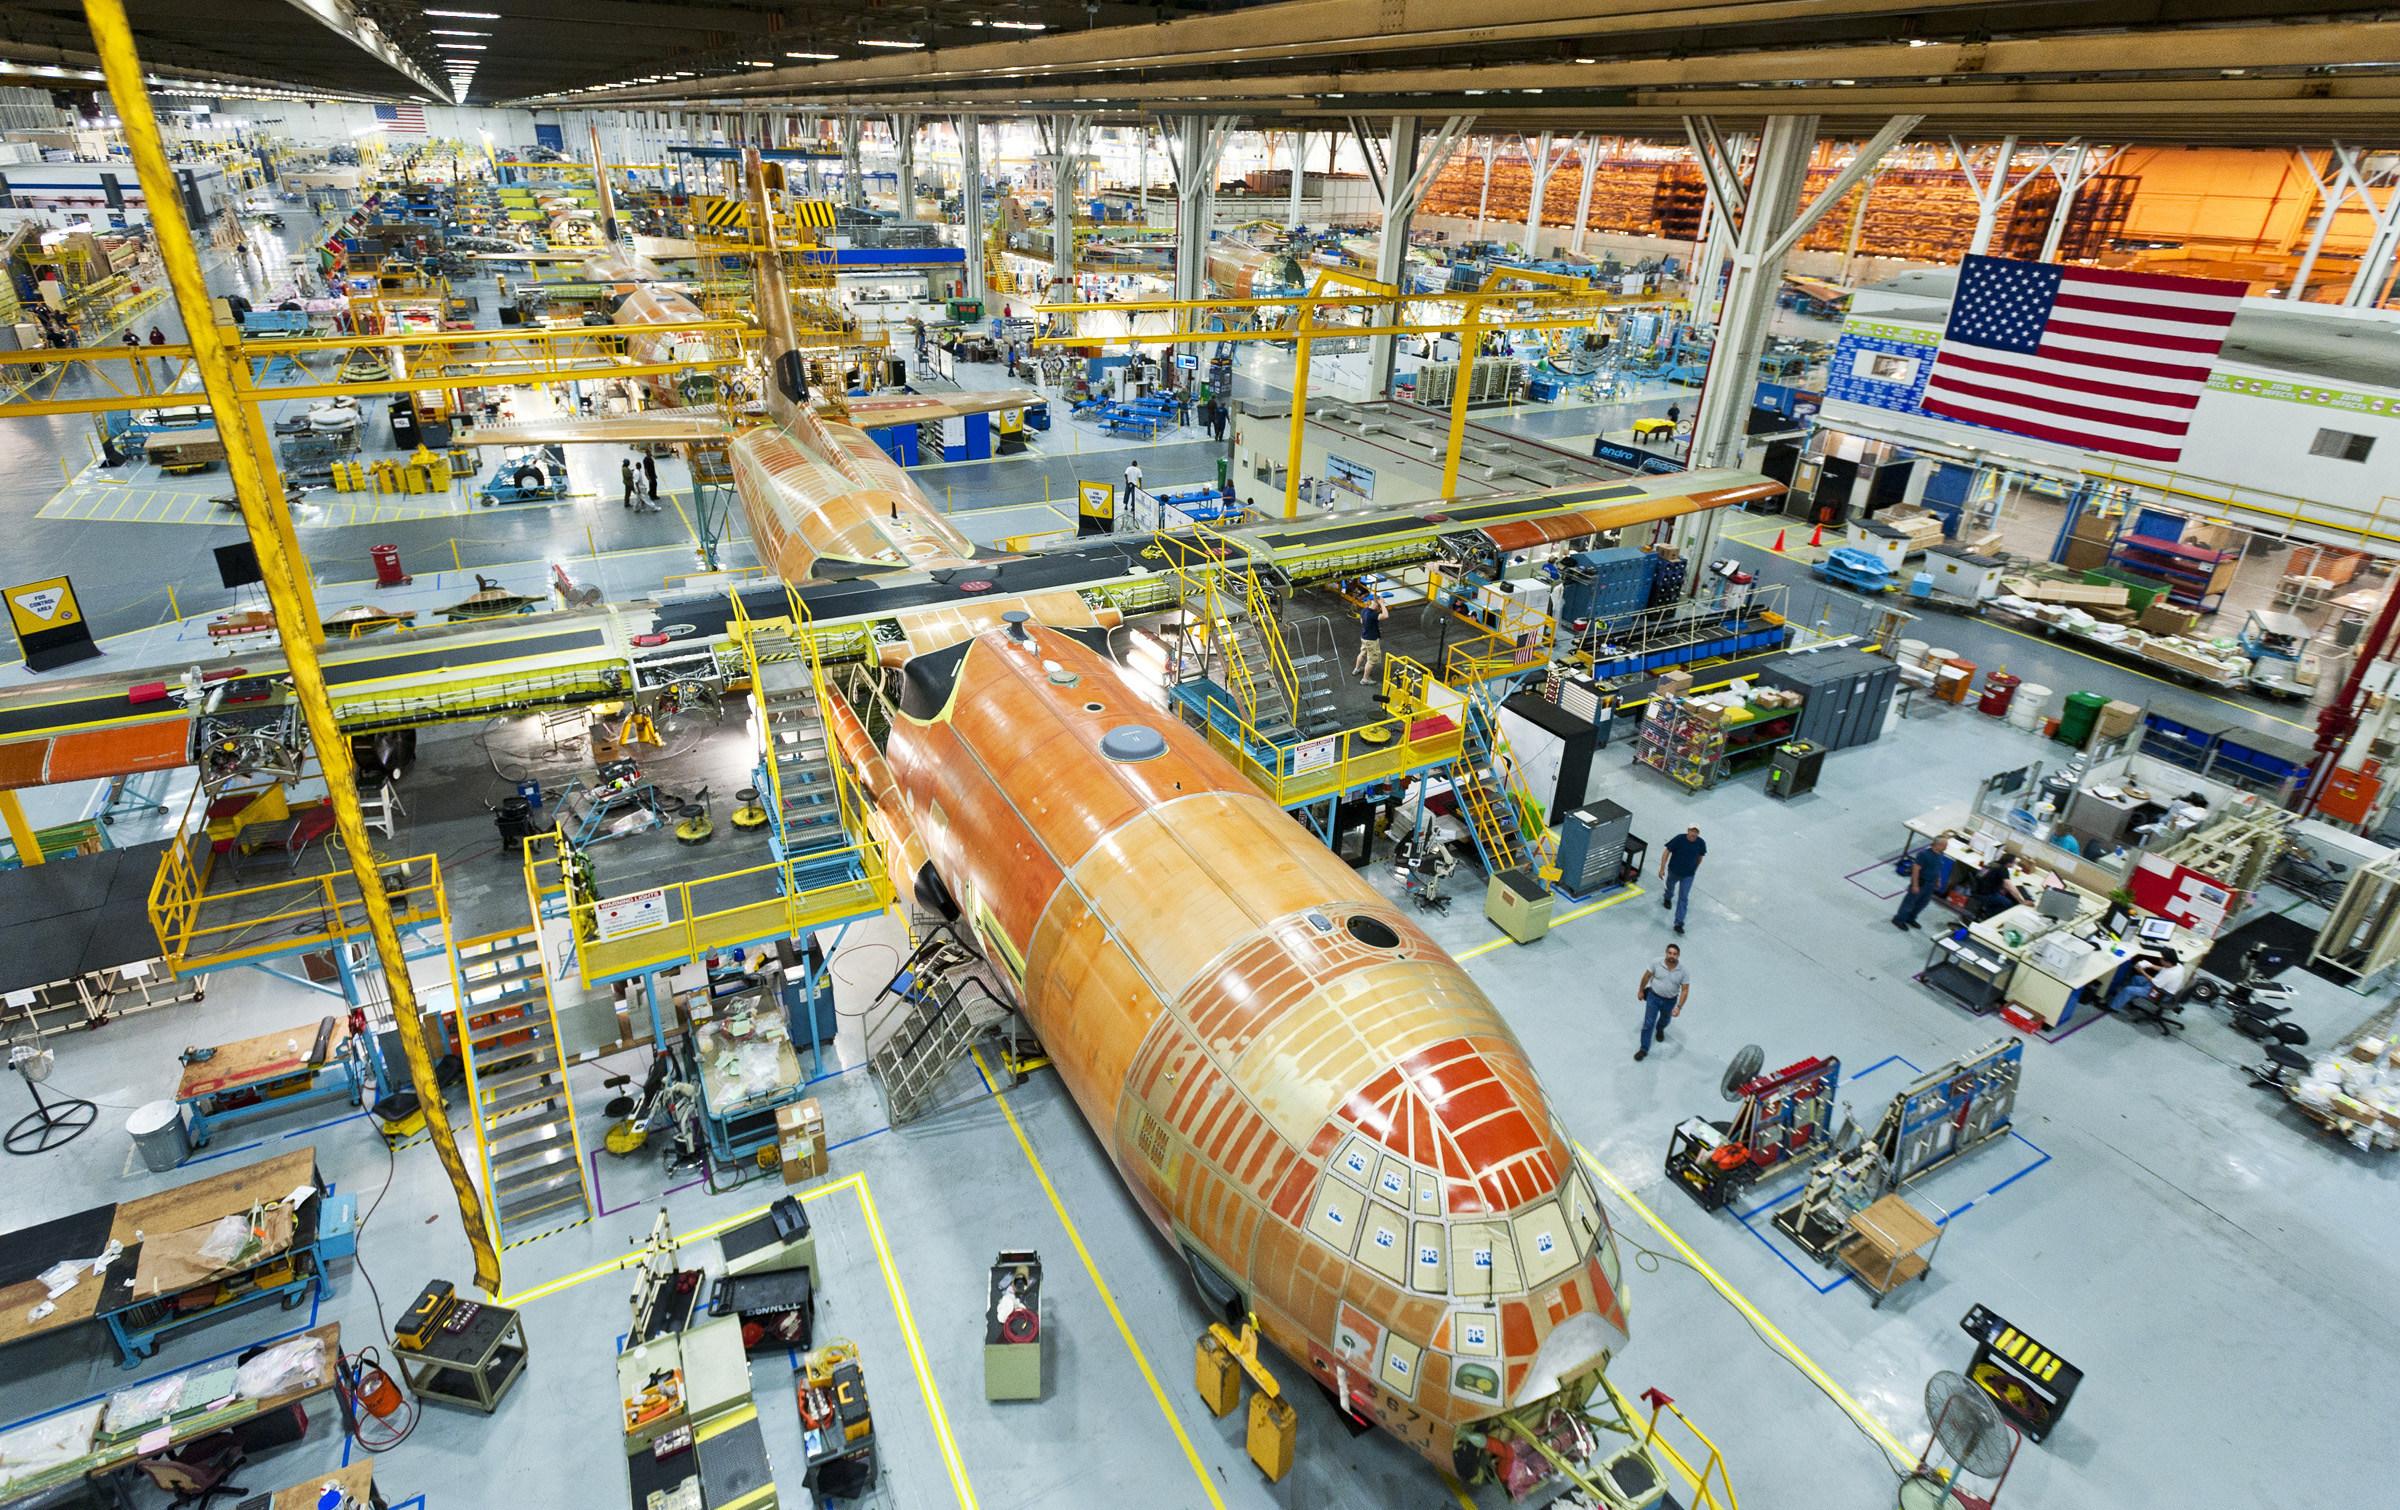 Lockheed Martin's C-130 Super Hercules production line in Marietta, Georgia. (PRNewsfoto/Lockheed Martin Aeronautics)